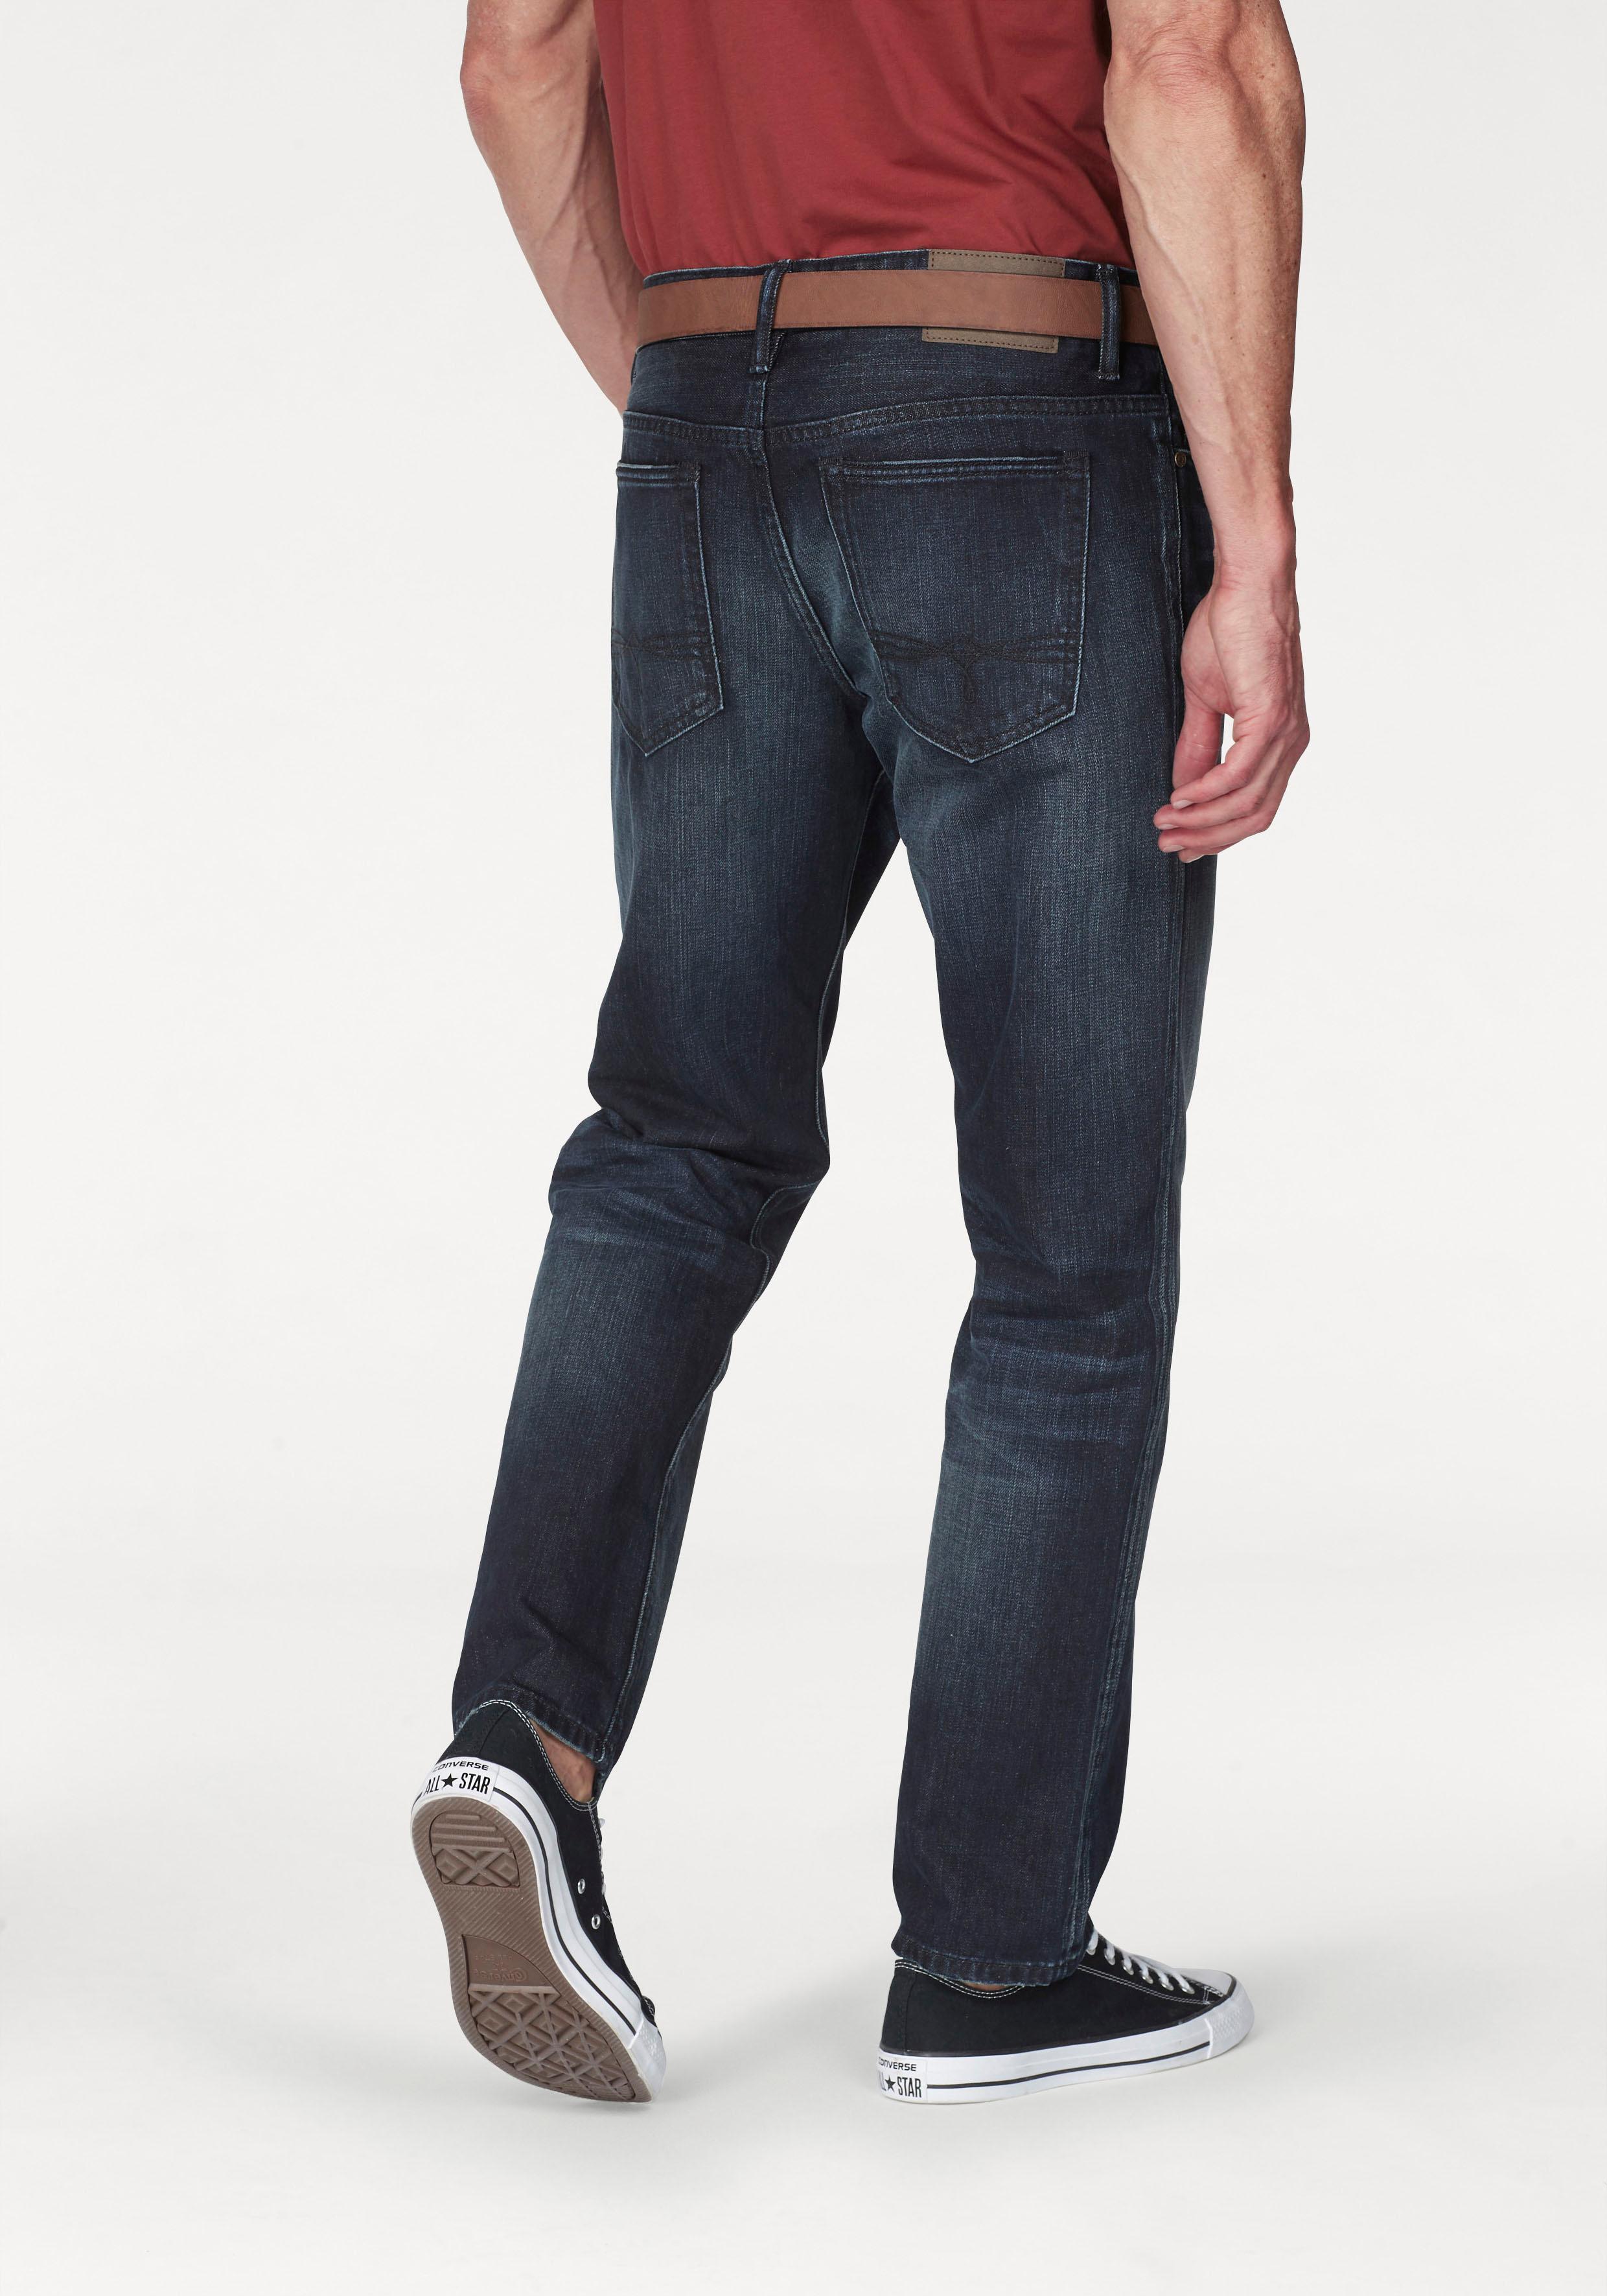 s.Oliver Slim-fit-Jeans (Set, mit Gürtel) blau Herren Slim Fit Jeans